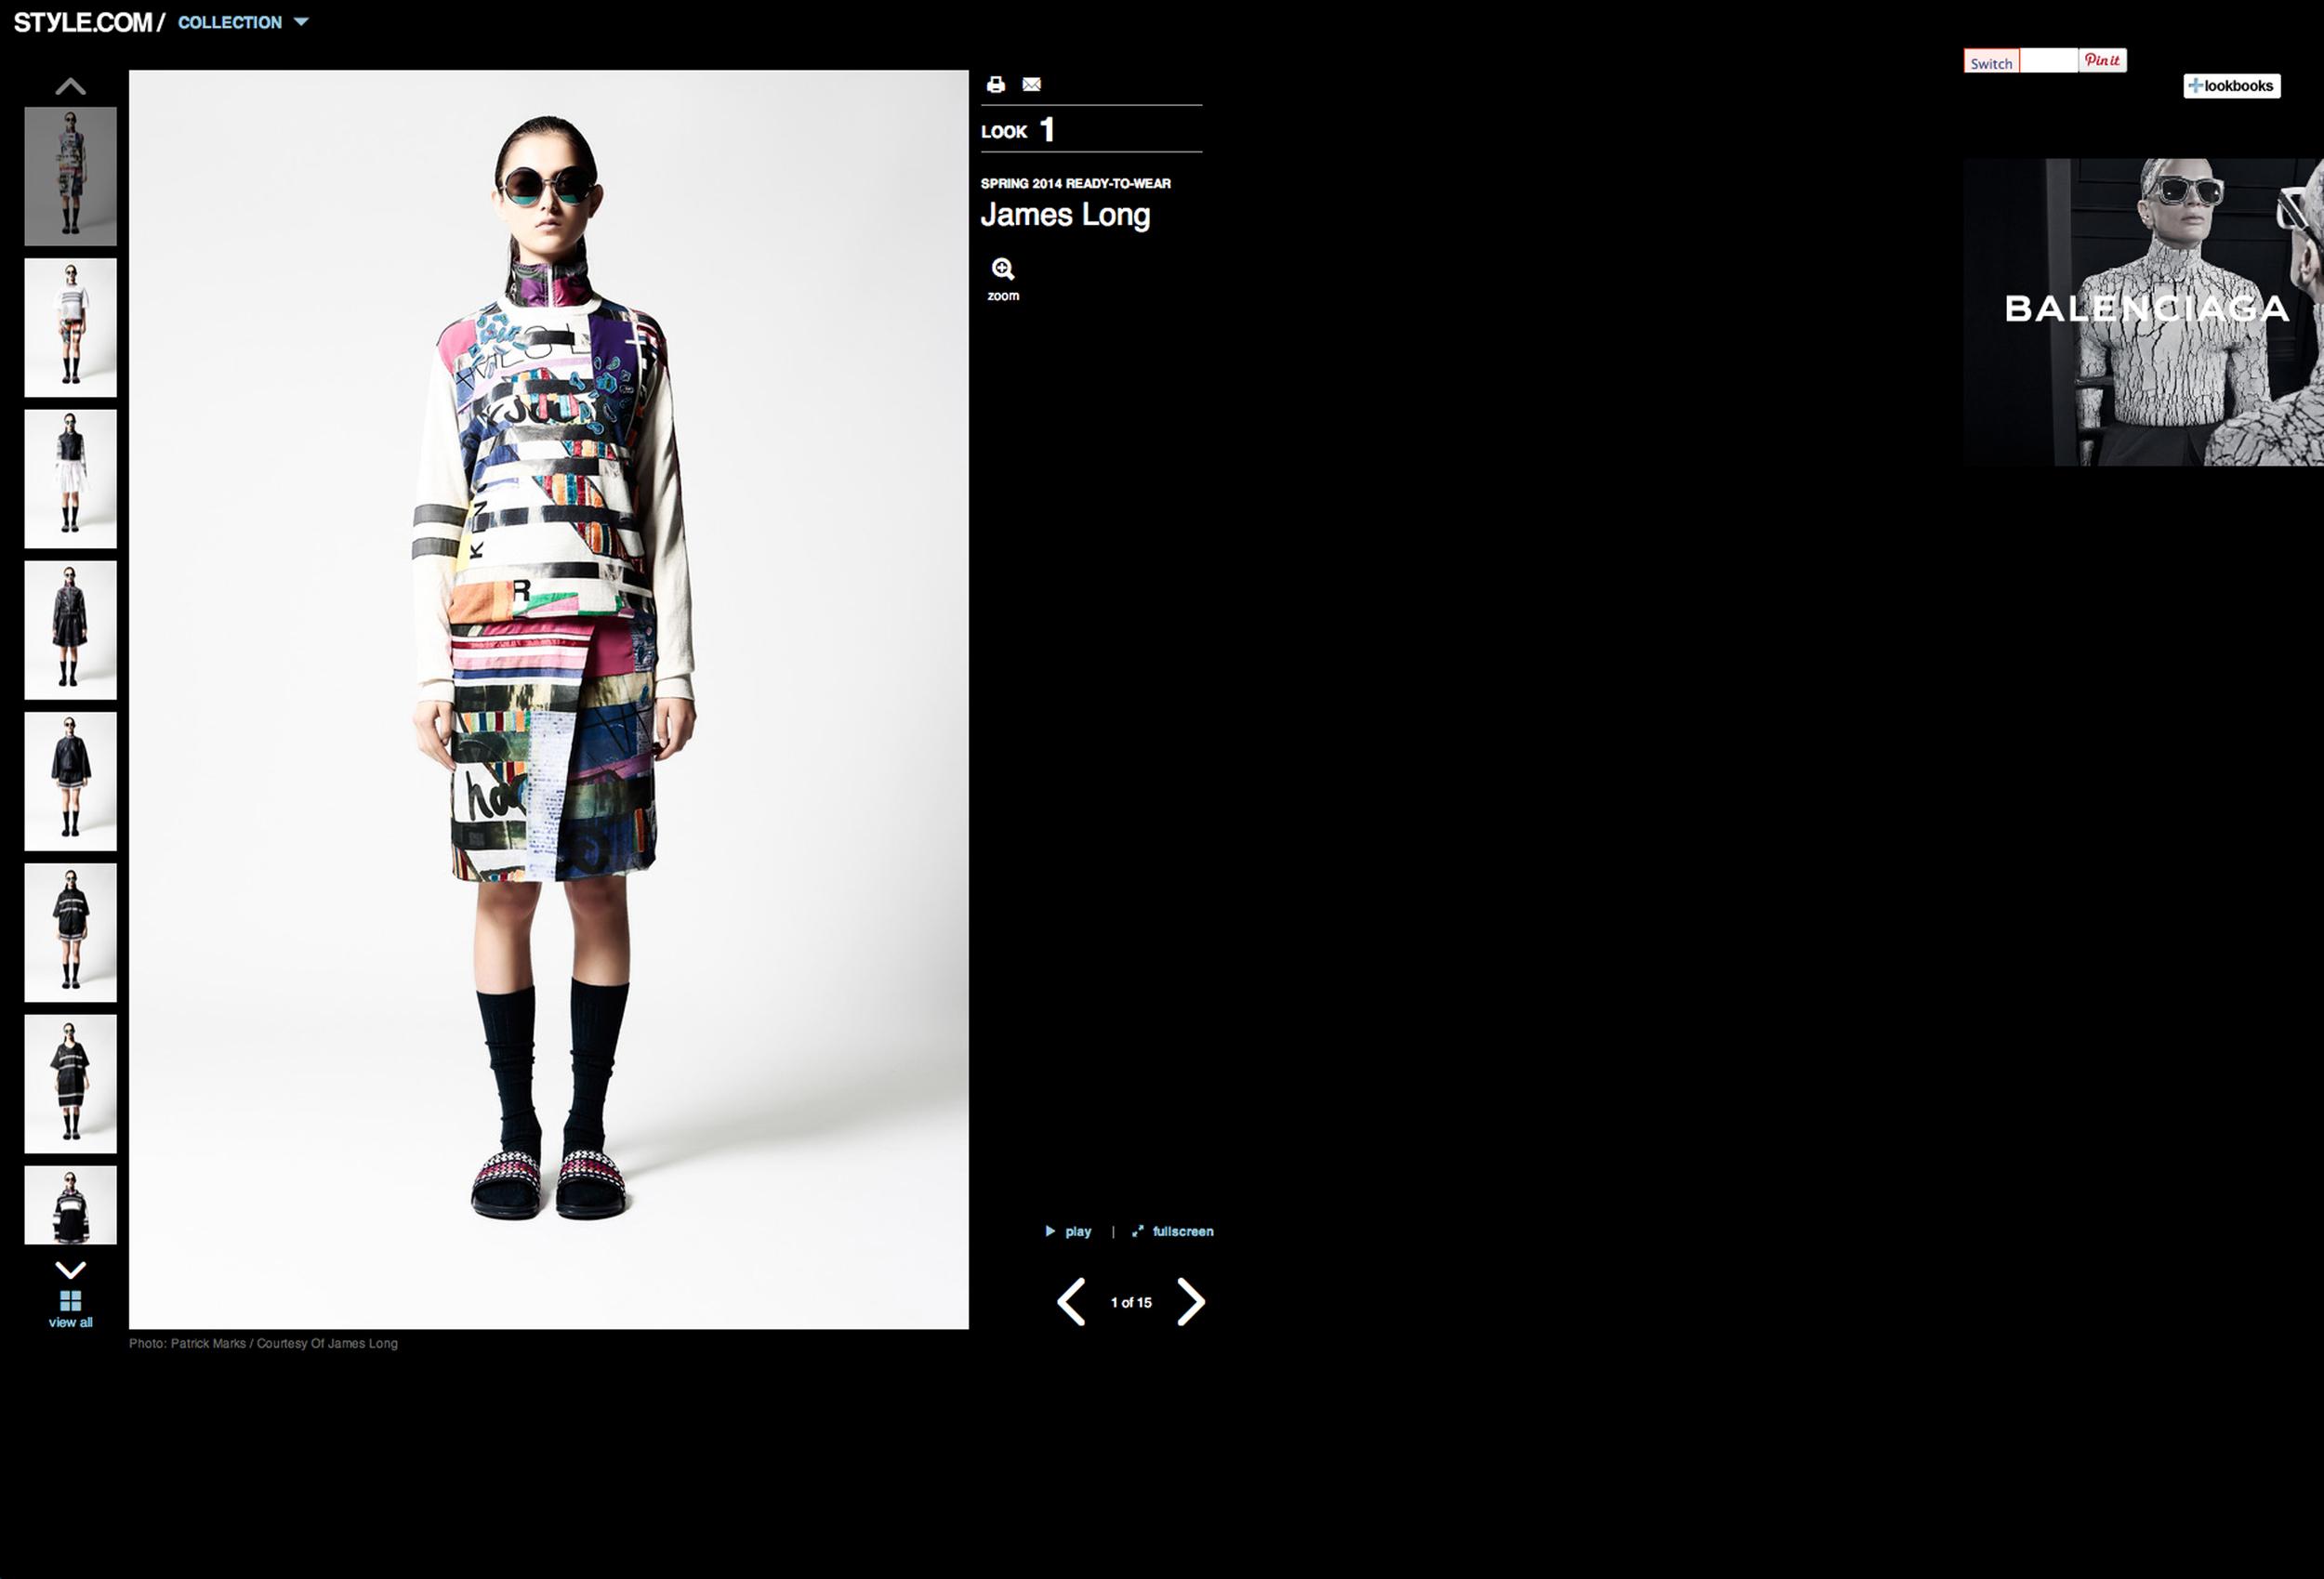 style.com jameslong tearsheet.jpg